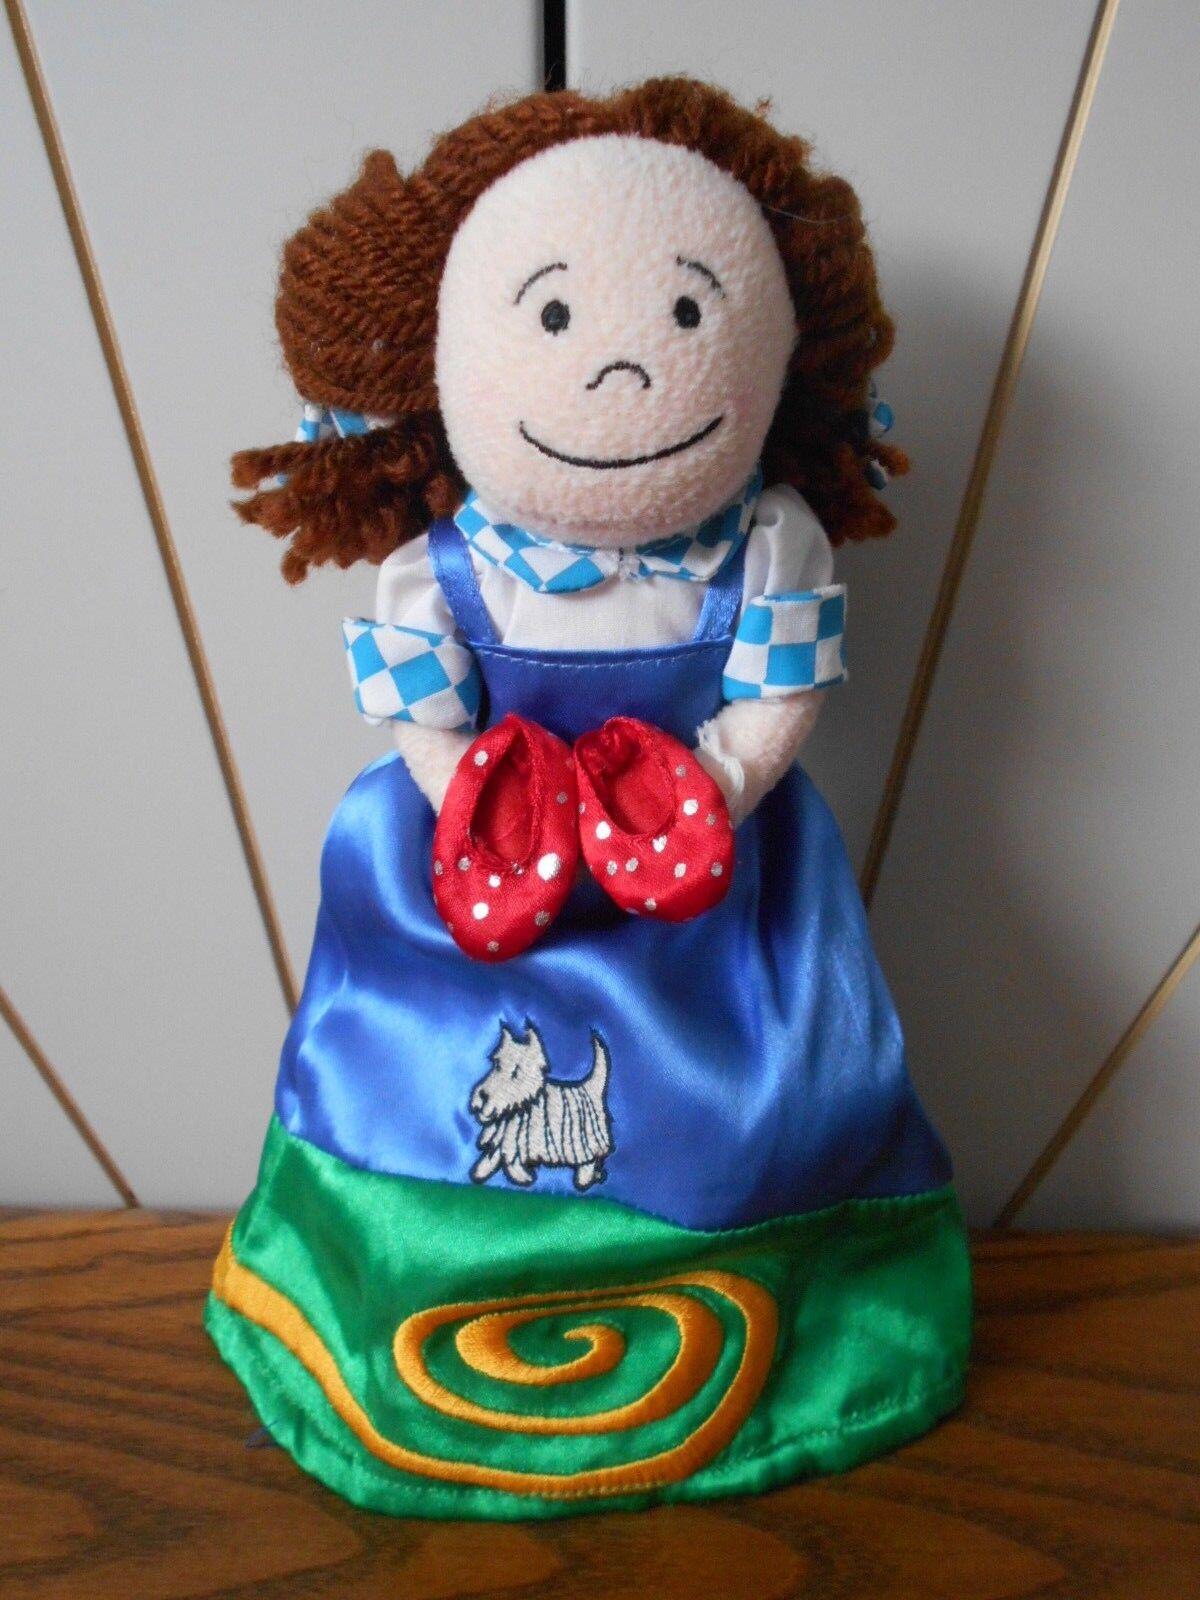 FAIRYTALE FOLK DgoldTHY Topsy Turvy Doll JELLY CAT Jellycat J569 WIZARD OF OZ